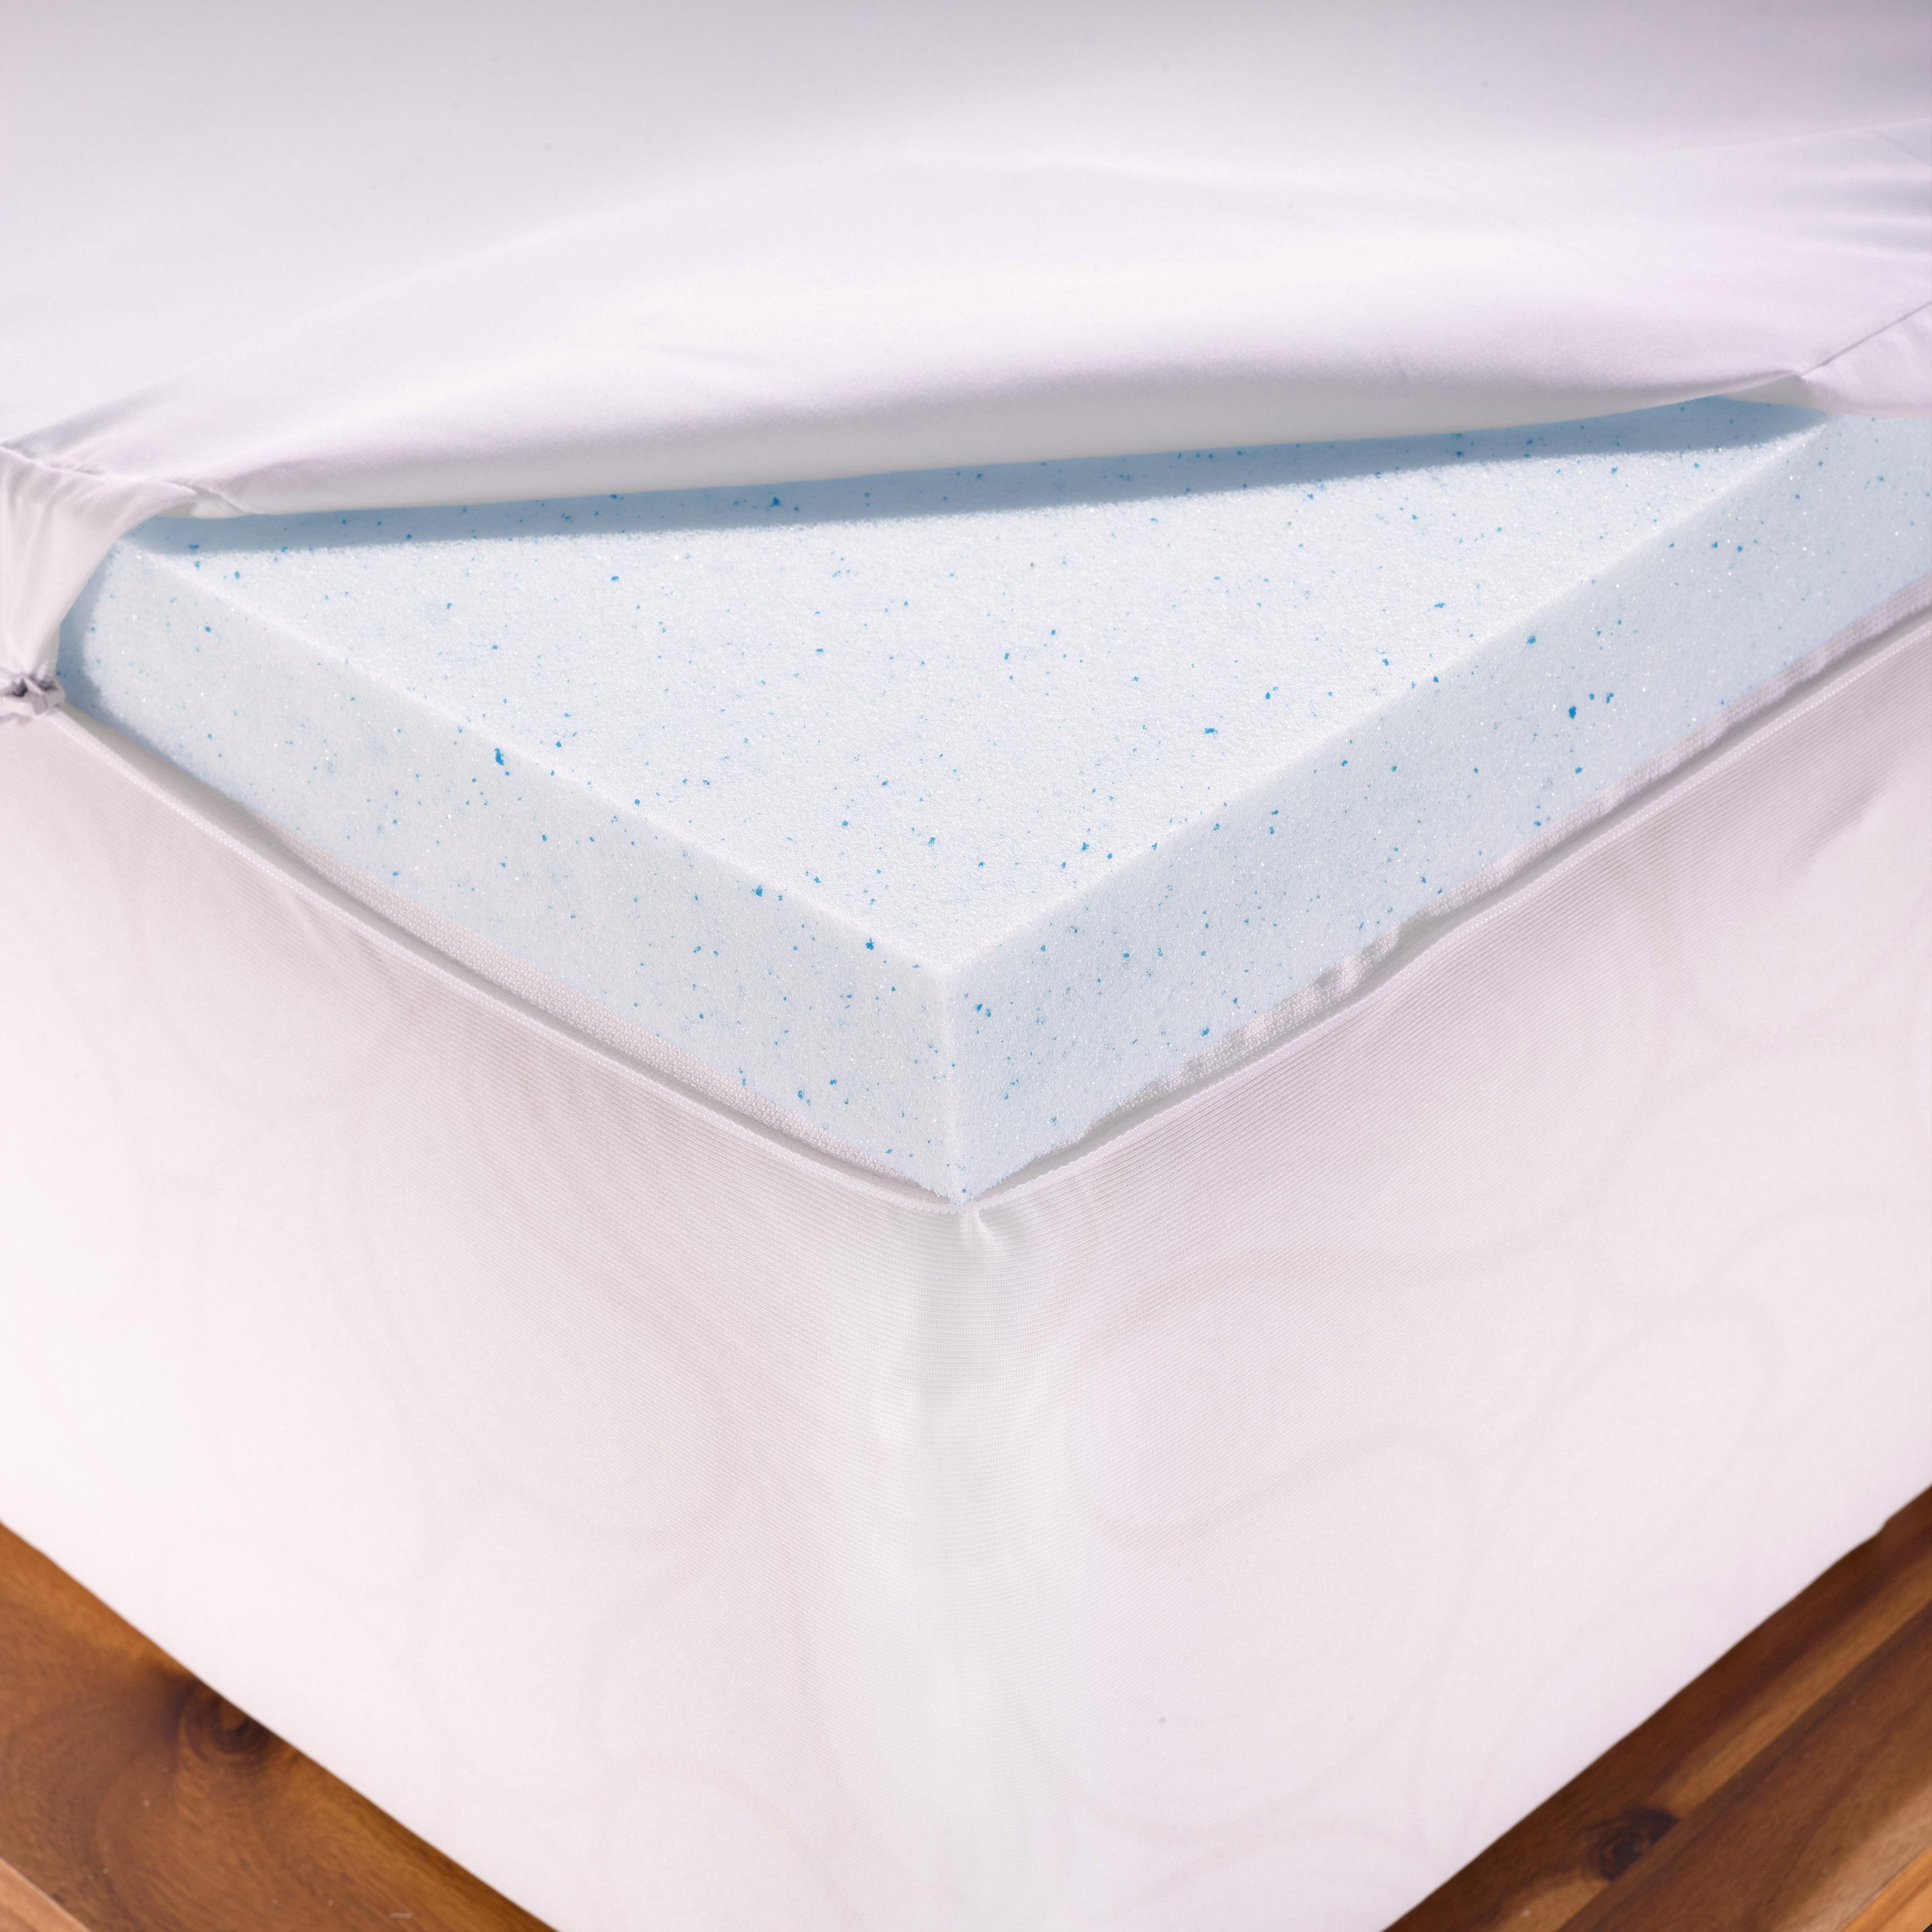 Authentic comfort twin xl 2-inch memory foam mattress topper